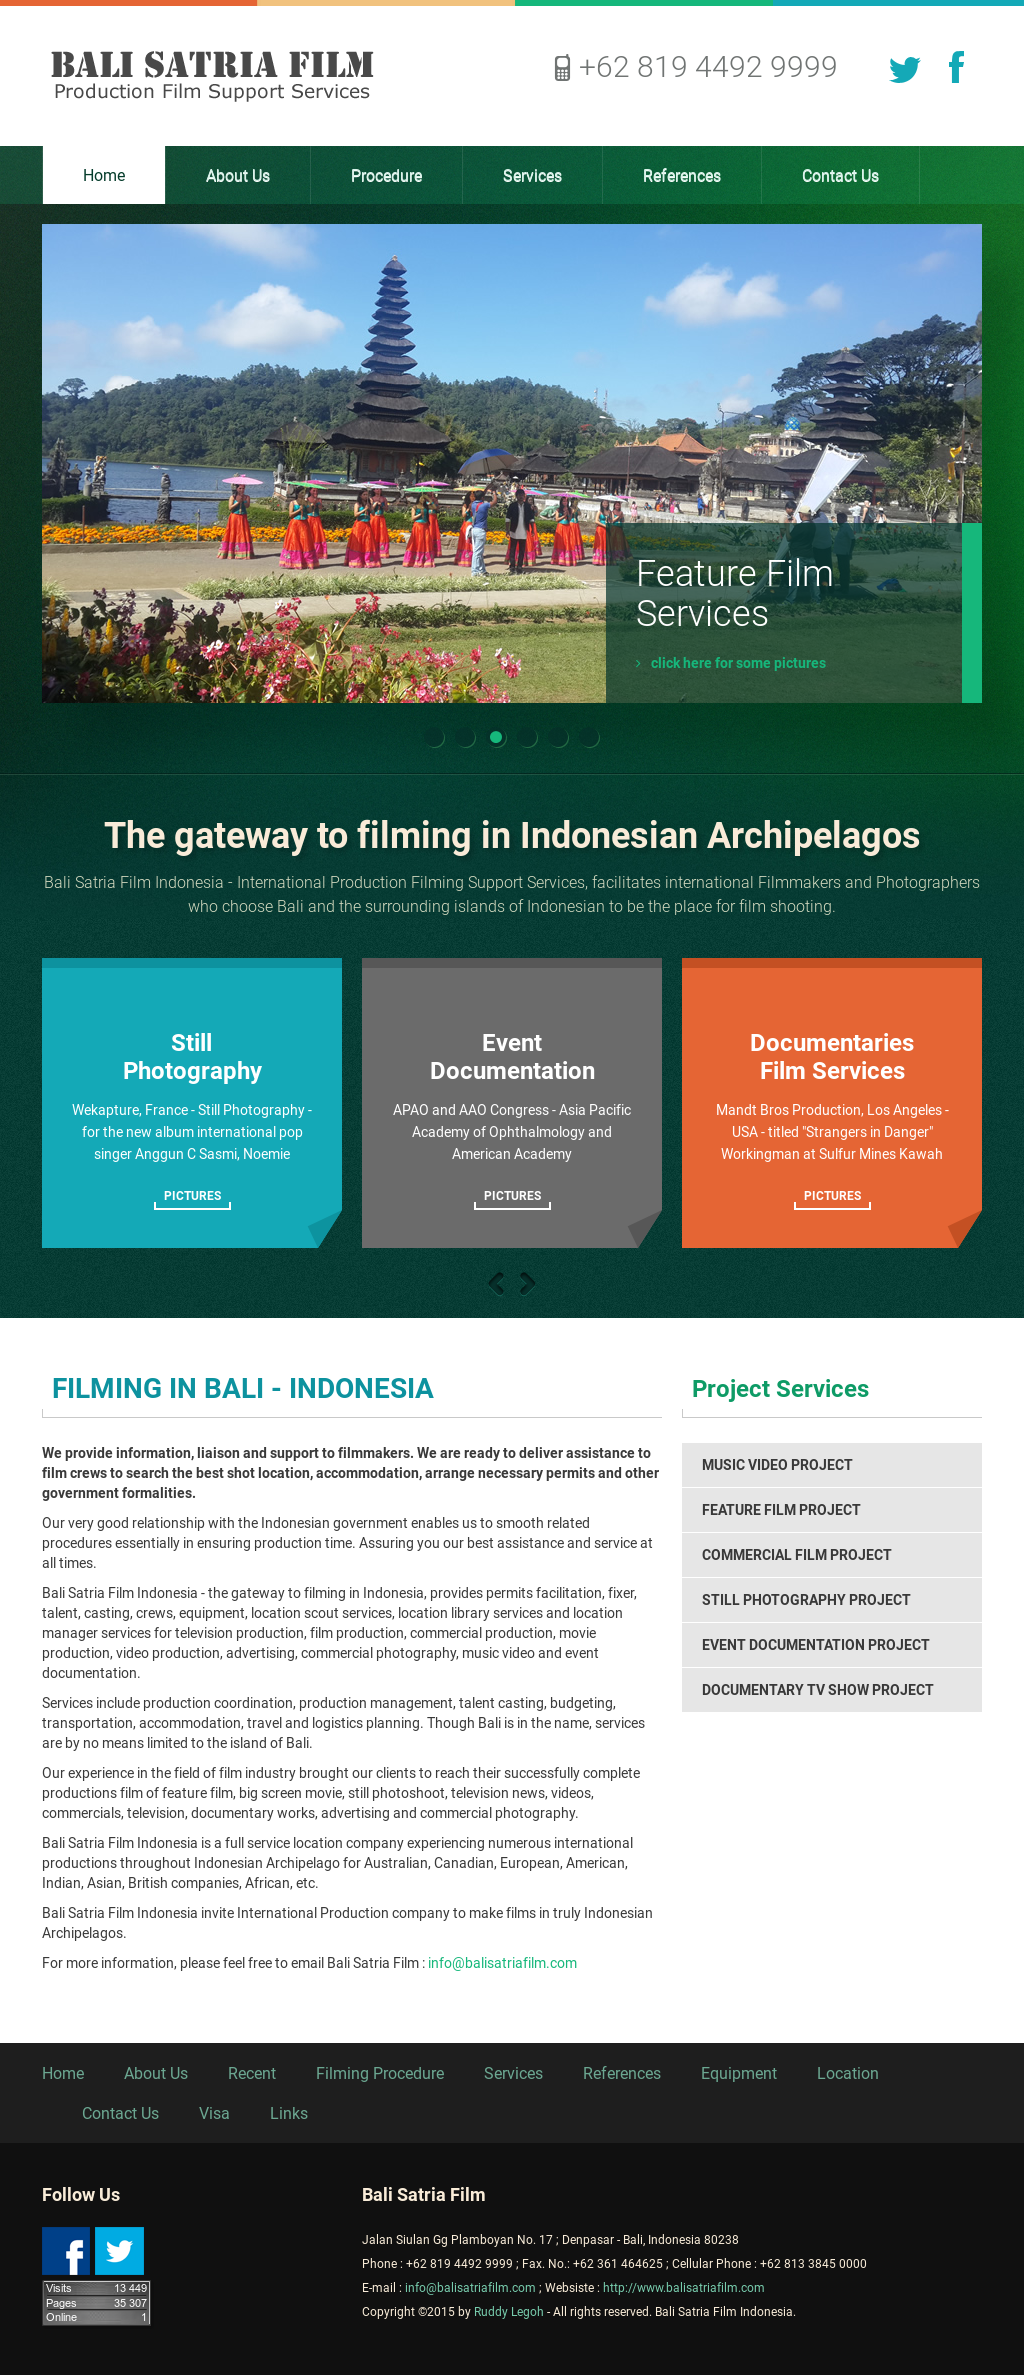 Bali Satria Film Indonesia Competitors, Revenue and Employees